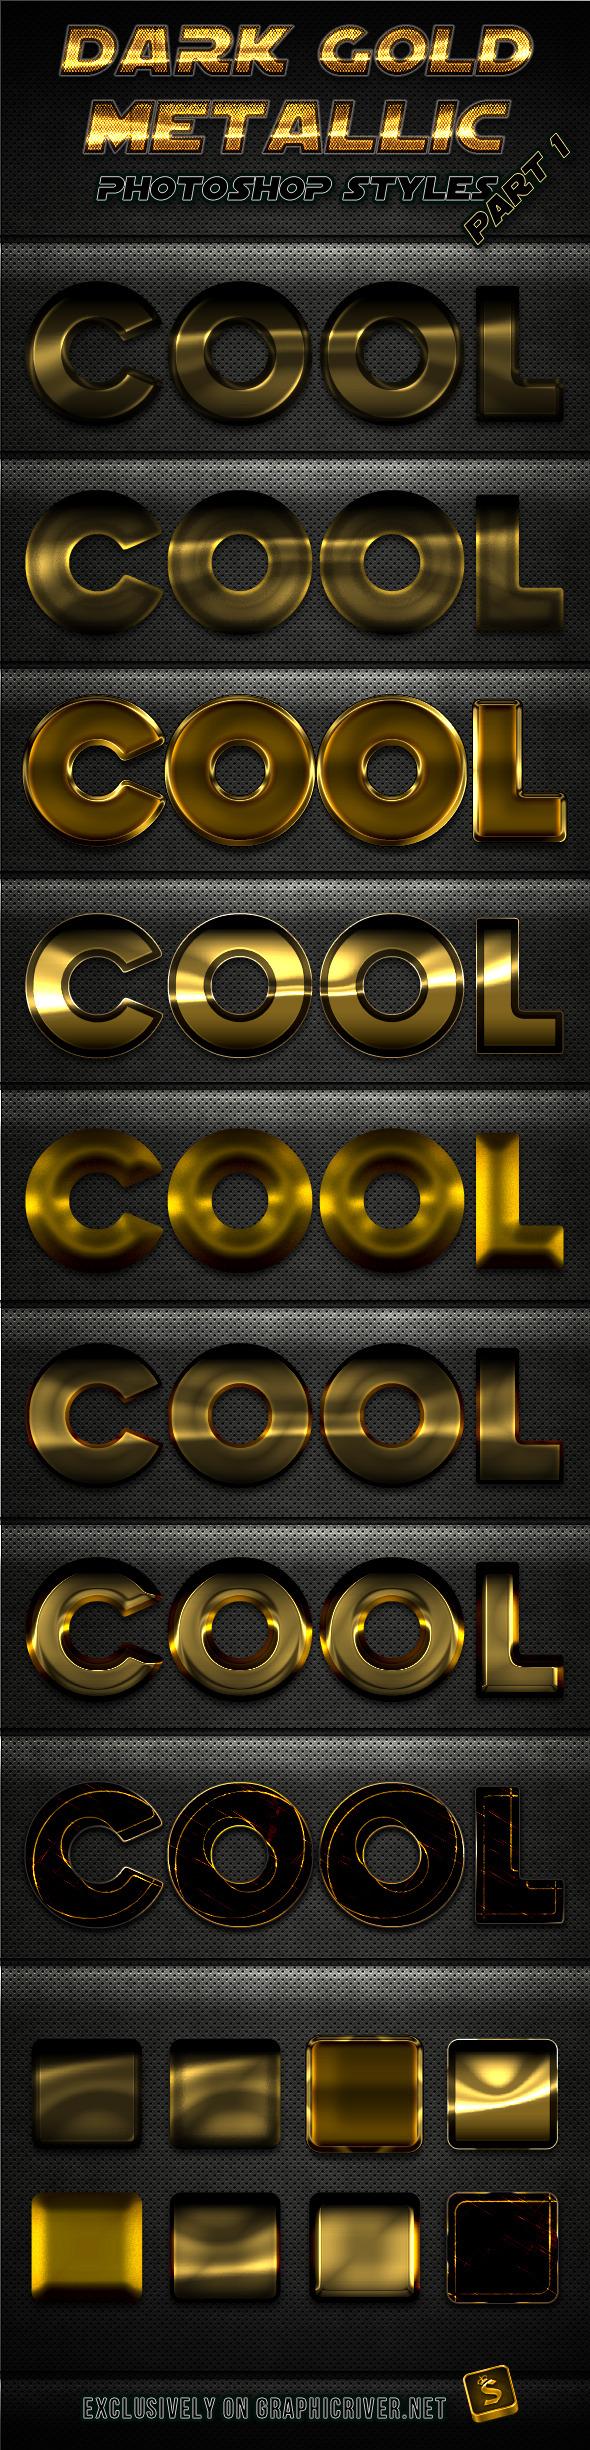 Dark Gold Metallic Photoshop Styles - Part 1 - Text Effects Styles